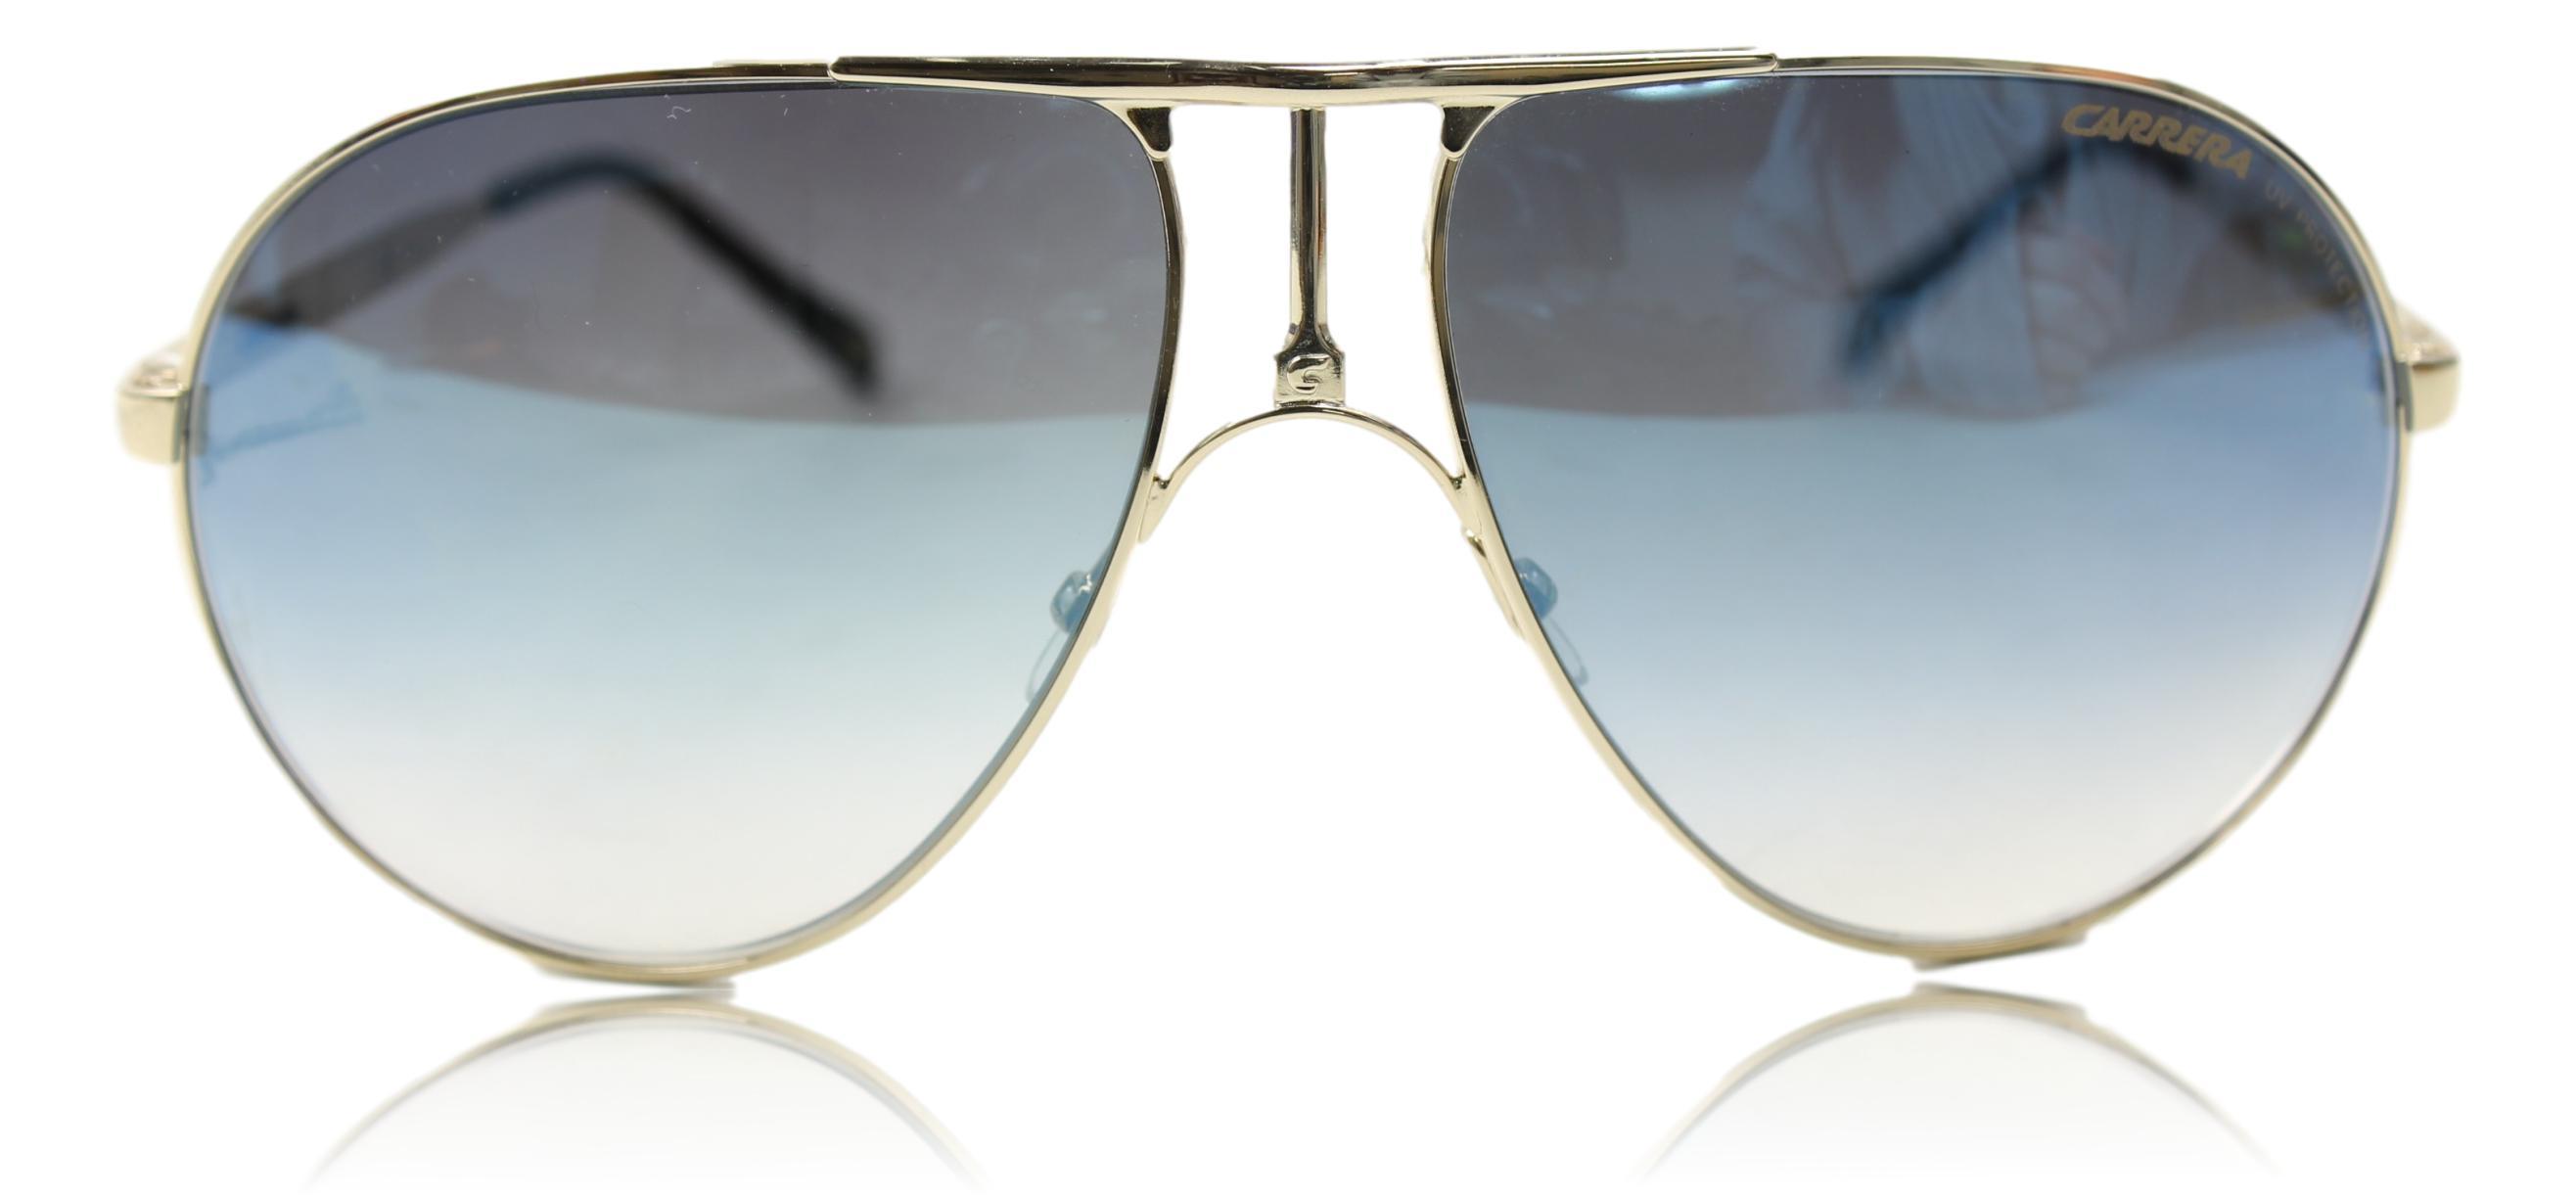 unisex 1 aviator sunglasses gold one size